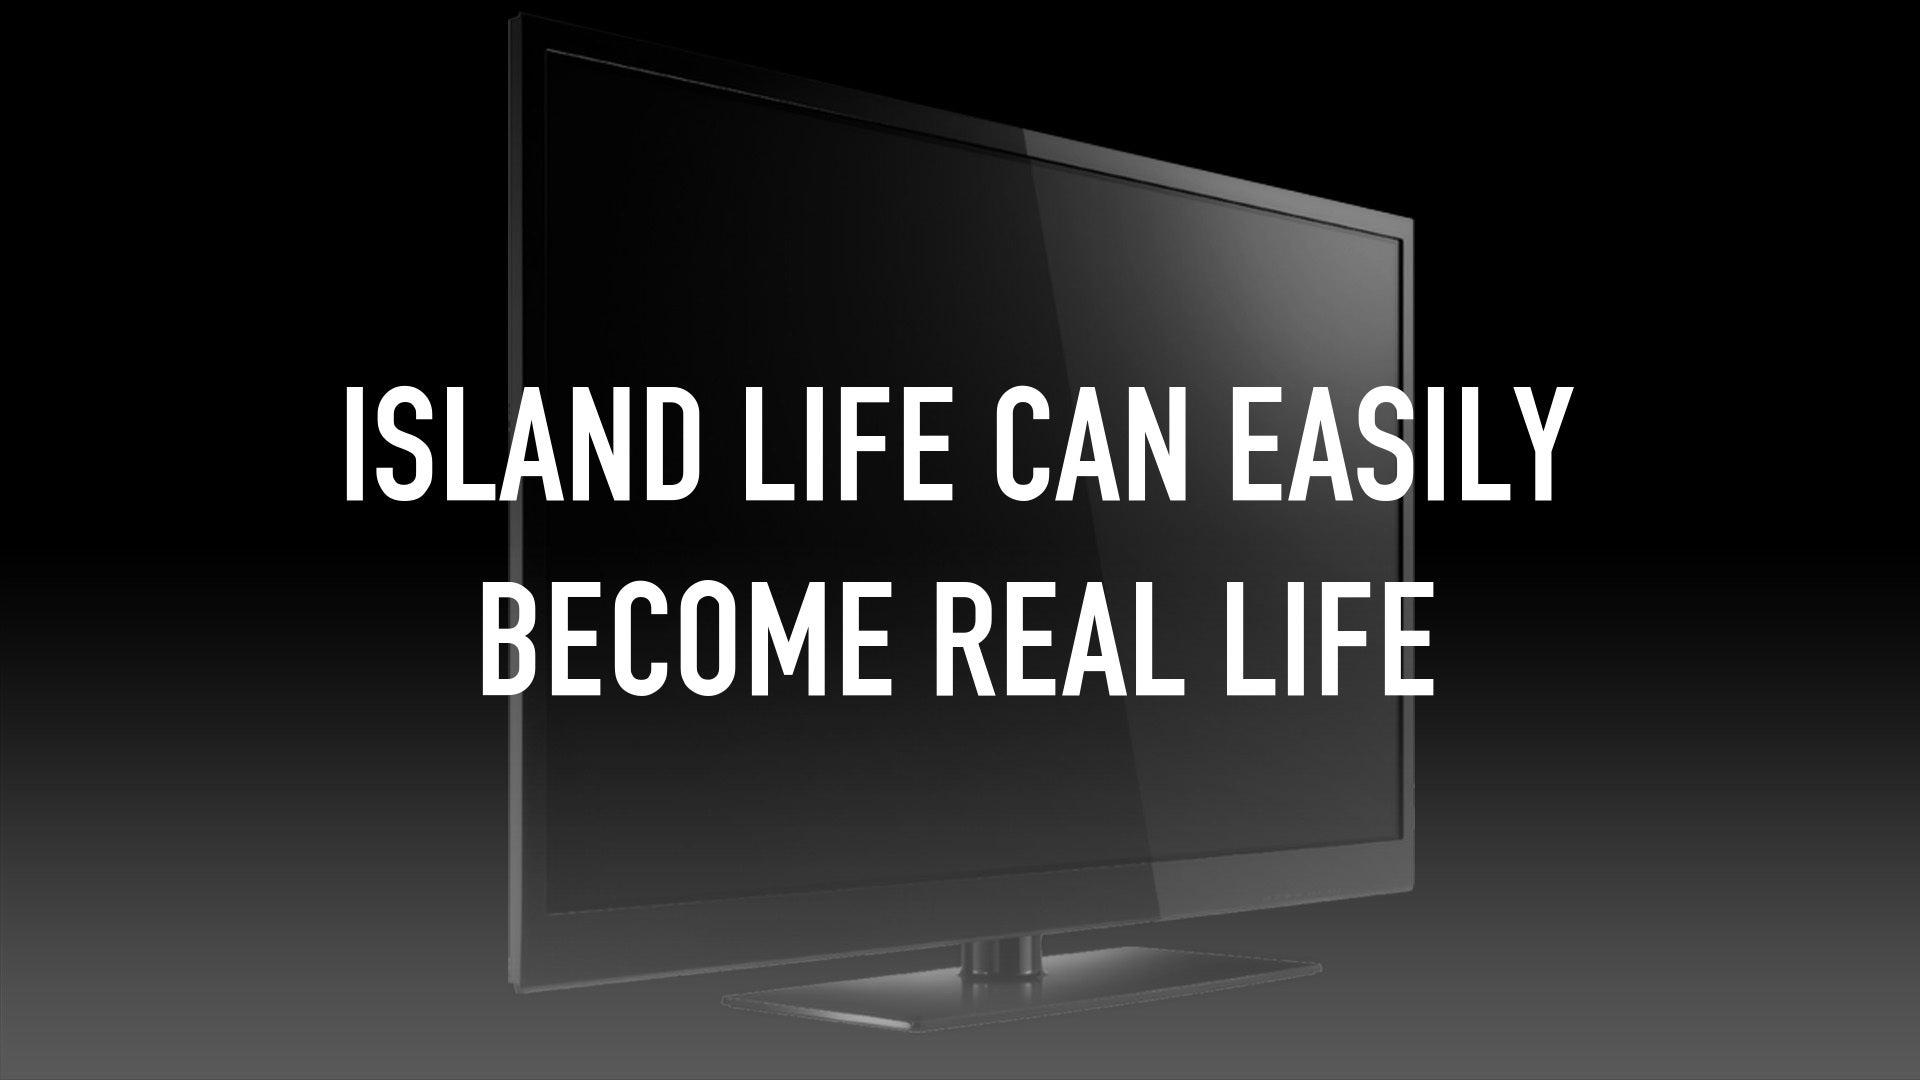 Island life can easily become real life